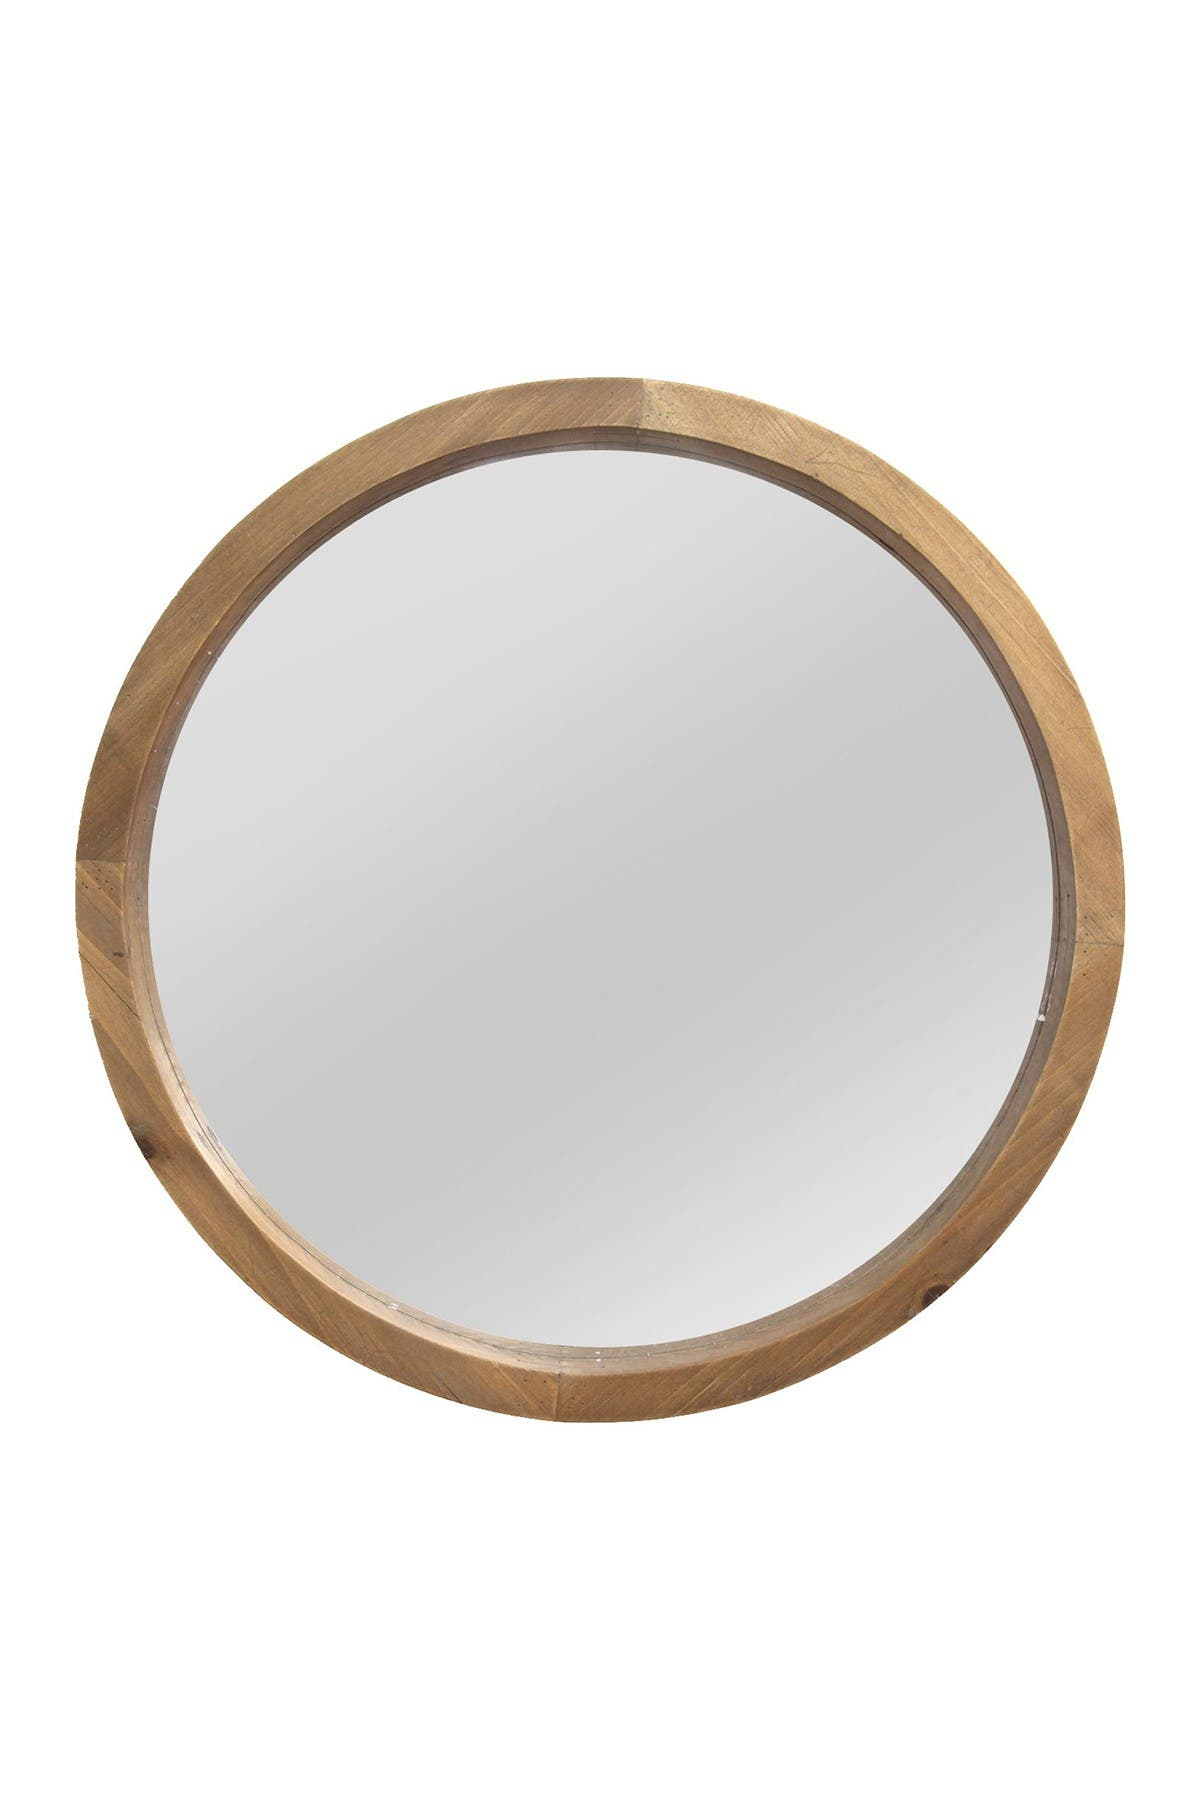 Image of Stratton Home Maddie Wood Mirror